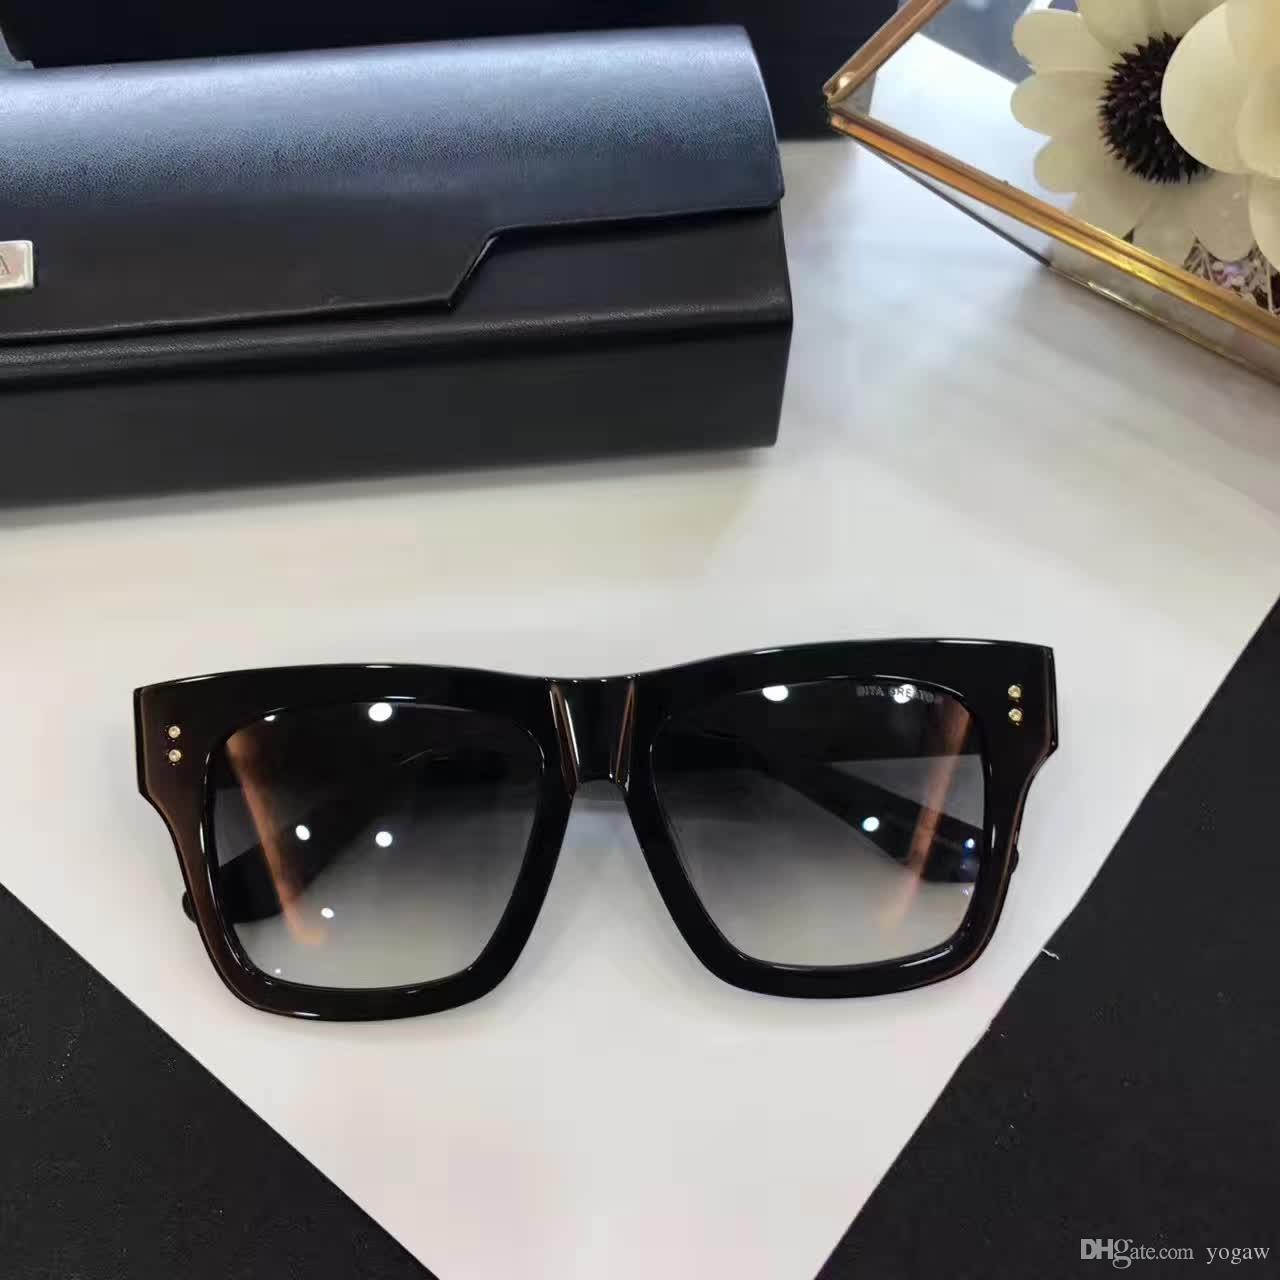 623312d45b57a Cool Mens Legends Square Sunglasses Shinny Black Frame Grey Gradient Lens  Designer Unisex Square Sunglasses Rare New With Box Glass Frames Online  Eyeglasses ...